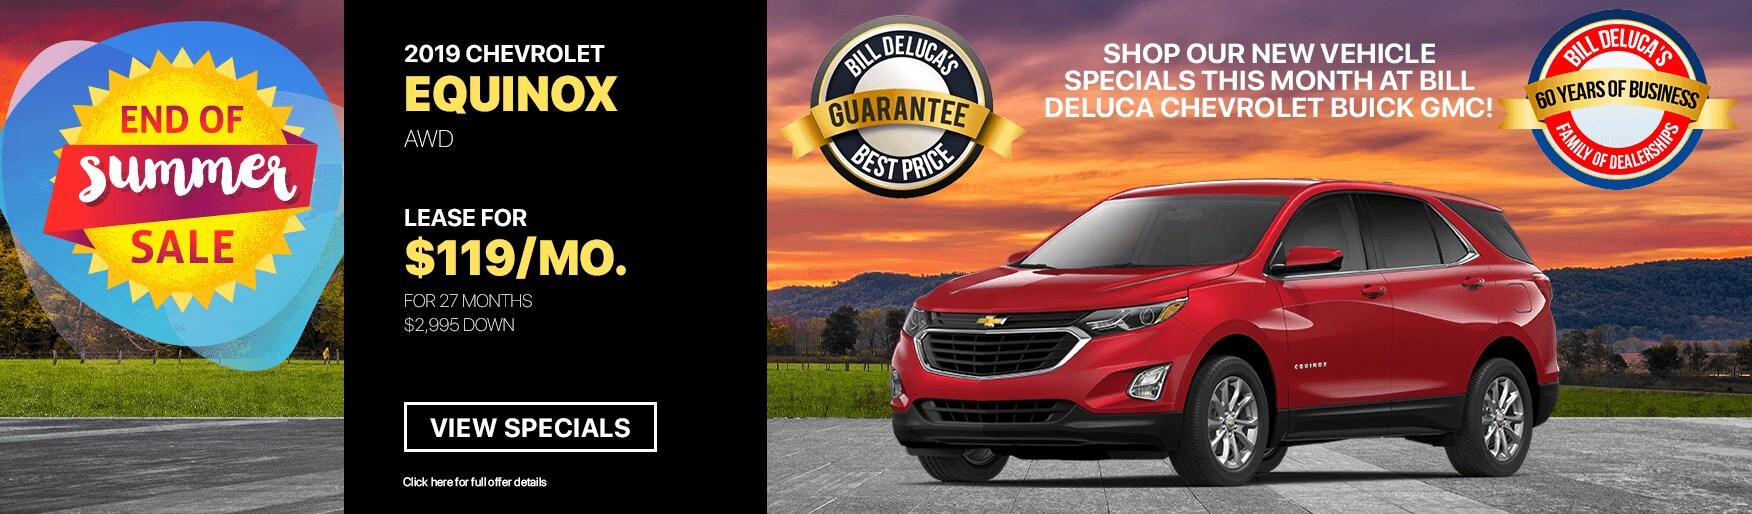 Bill Deluca Family Of Dealerships New Cadillac Dodge